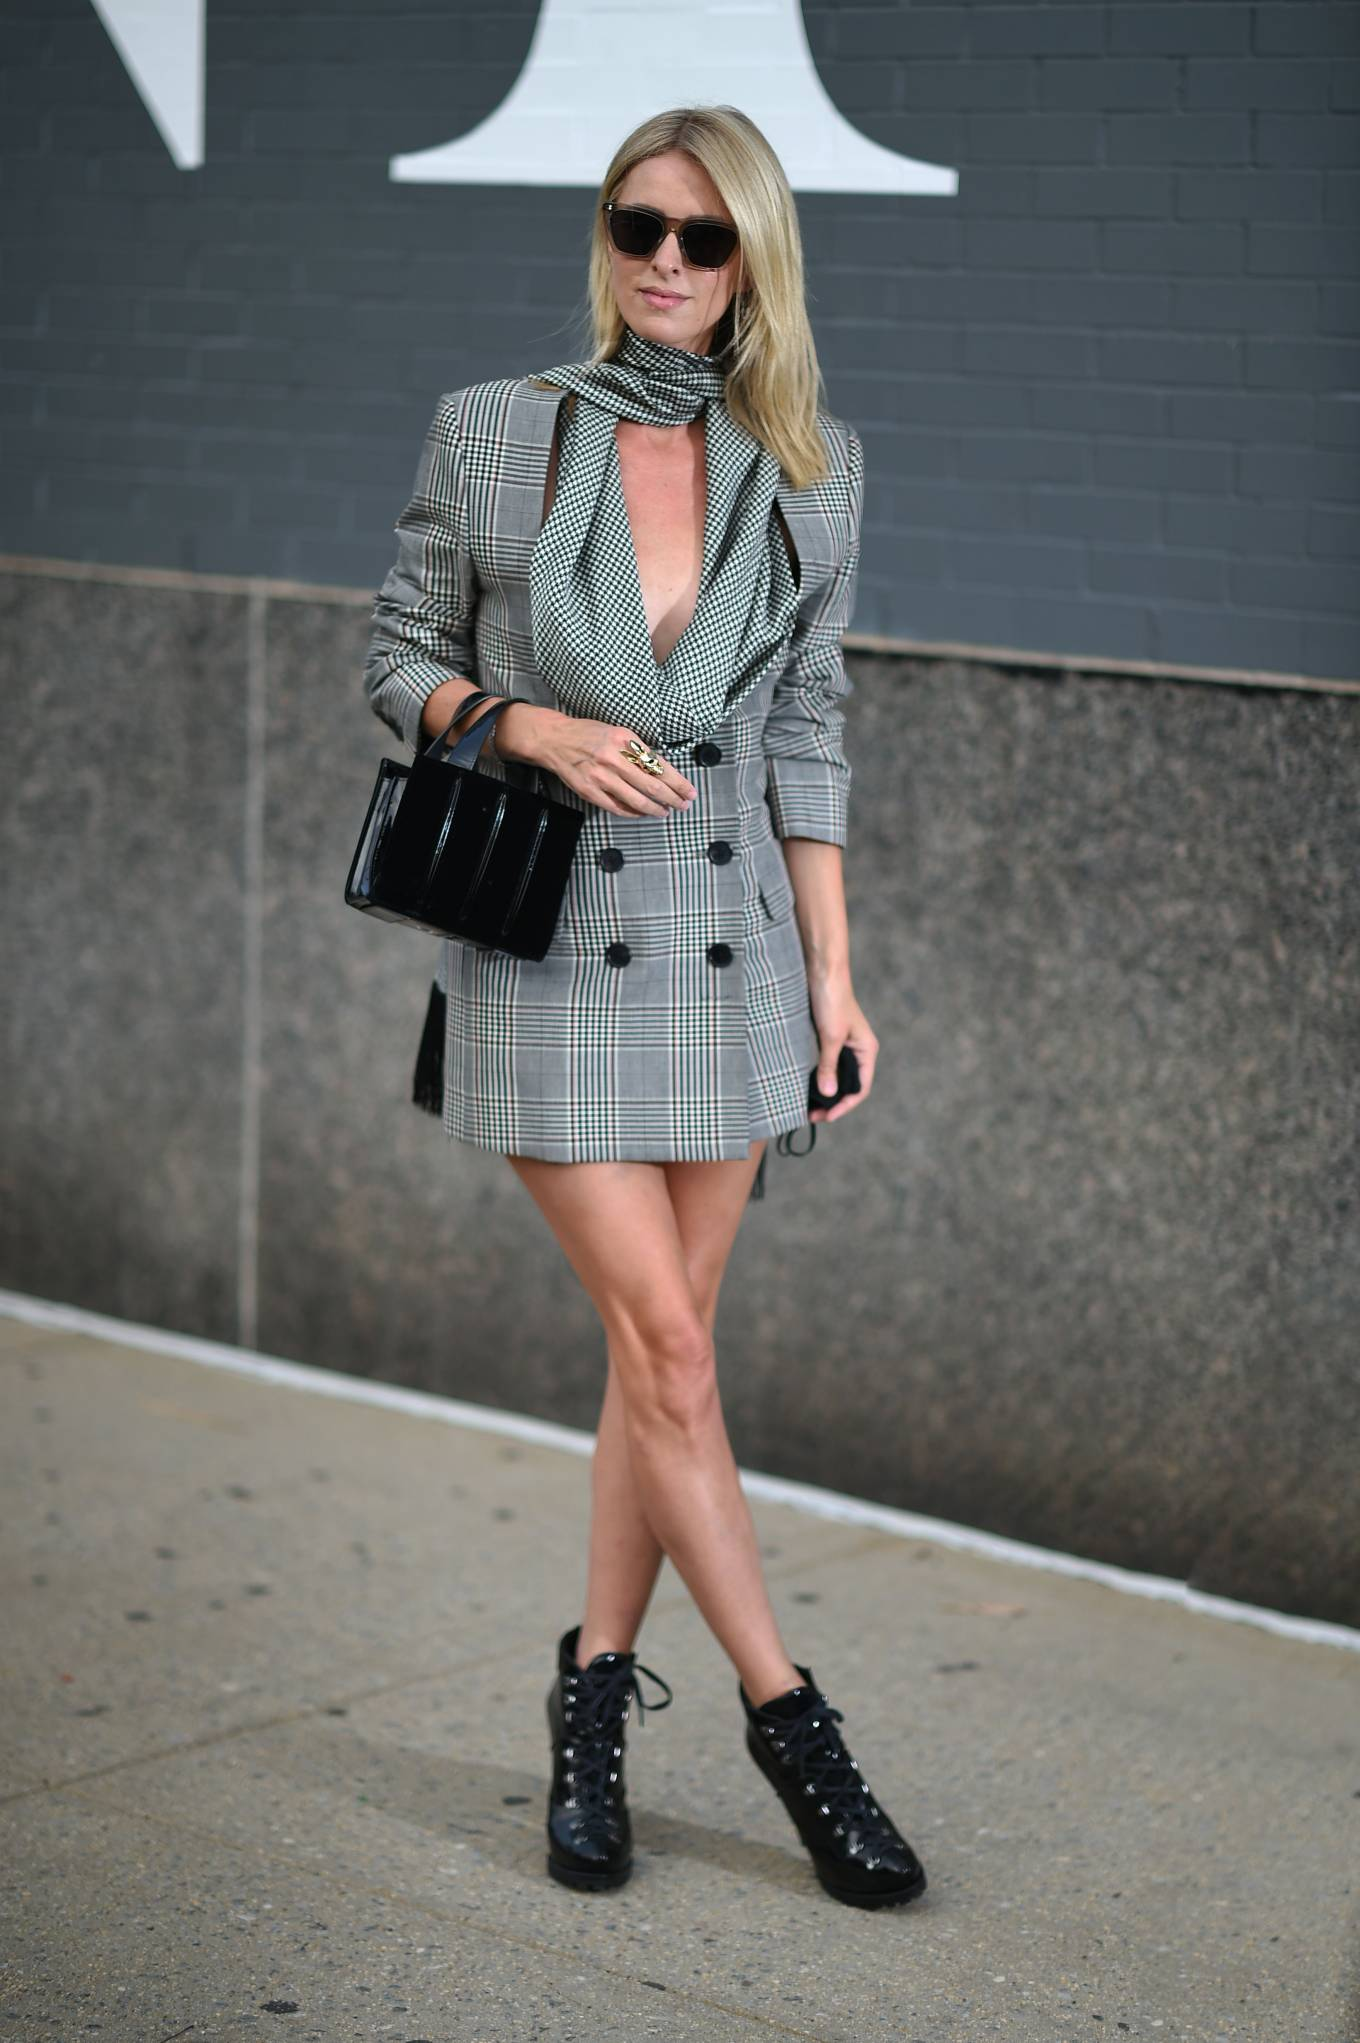 Nicky Hilton - New York Fashion Week - Monse Fall-Winter 2020 Presentation